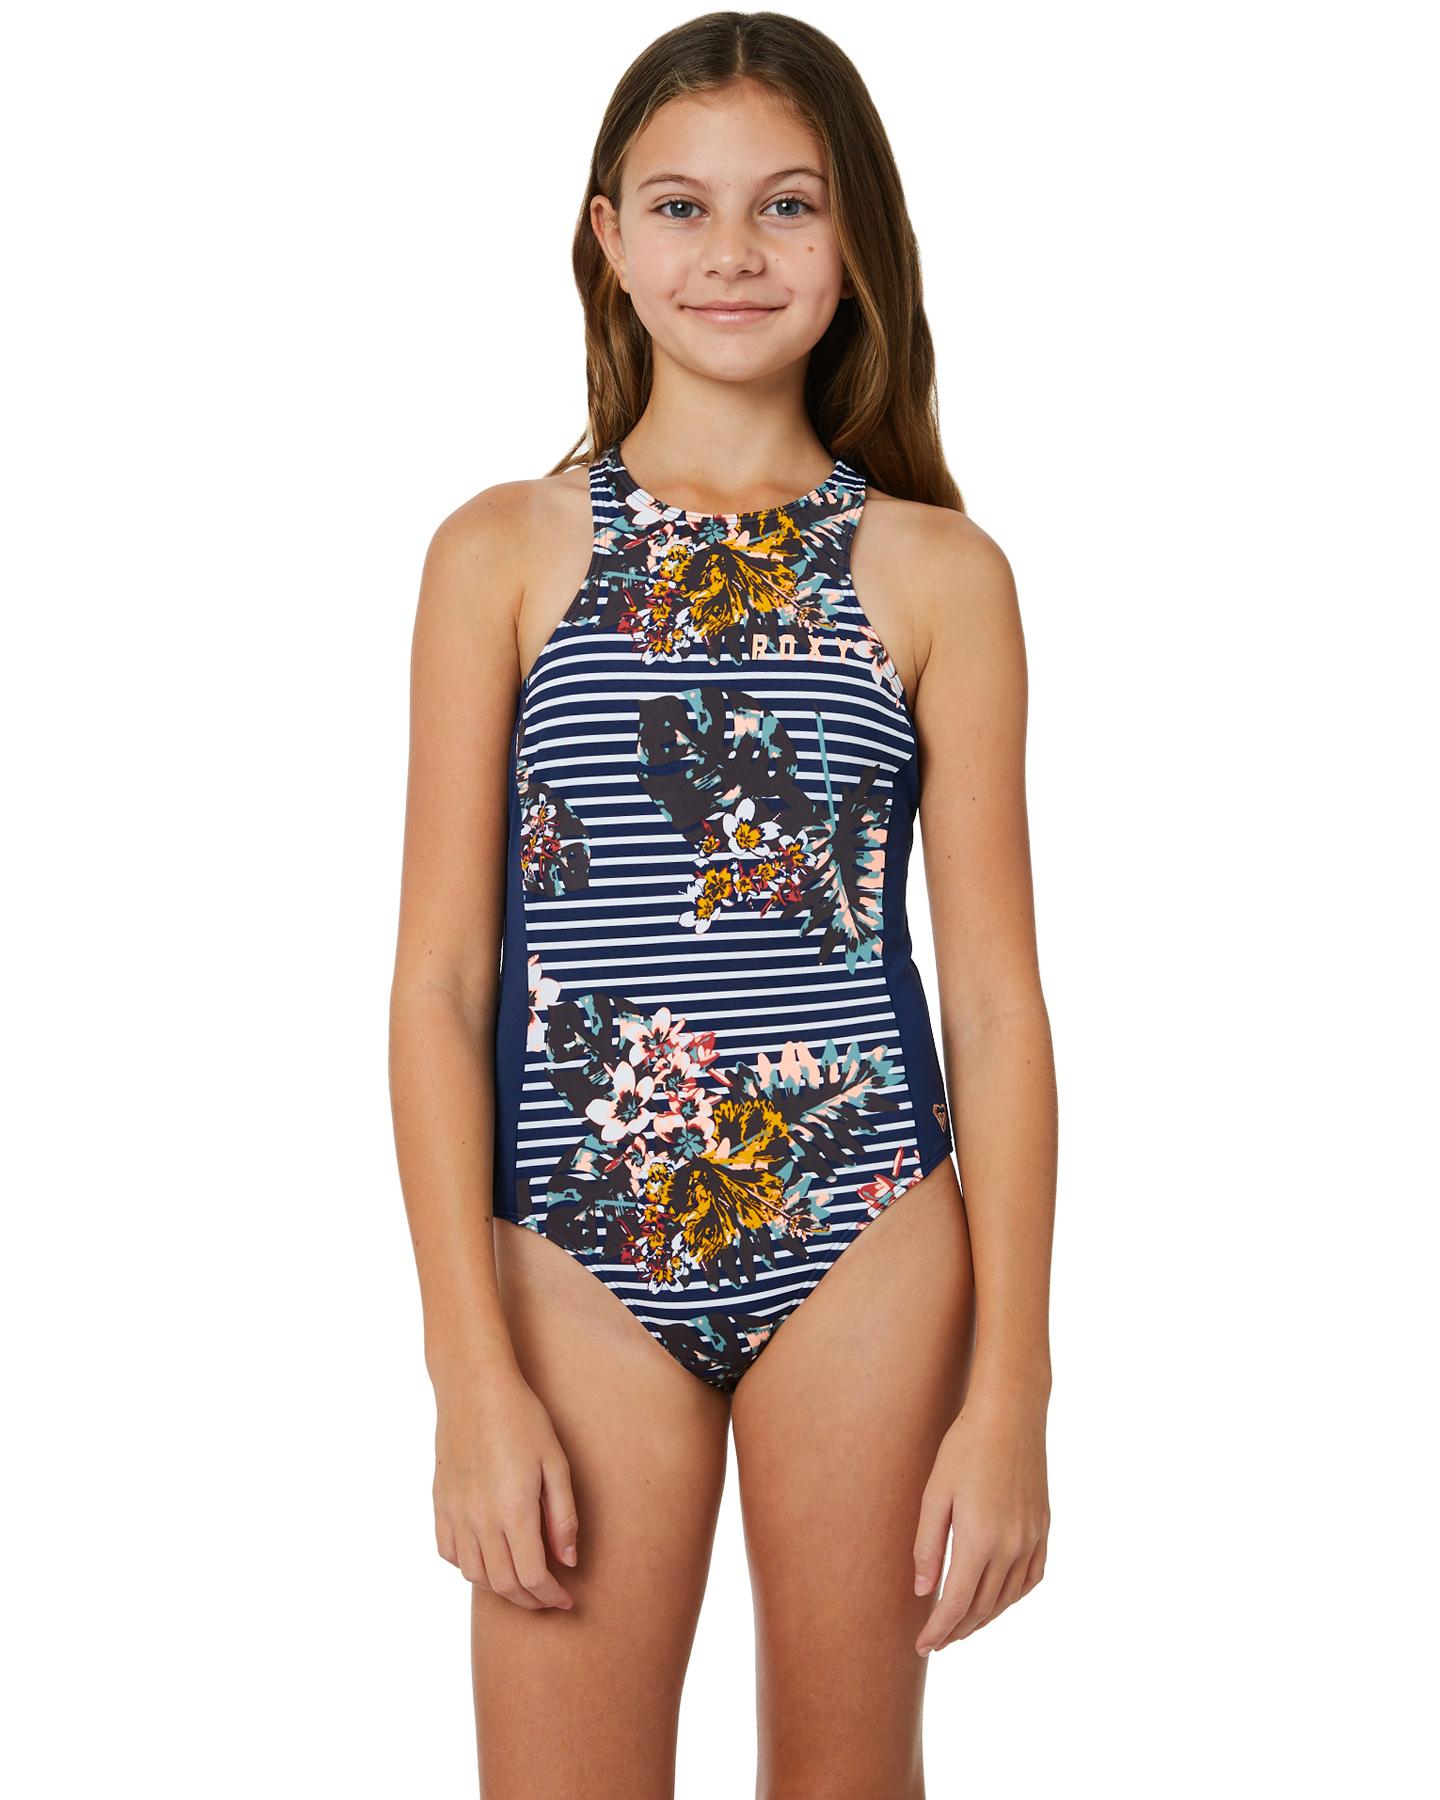 73d62100ac8b1 Roxy Keep In Flow One Piece Medieval Blue Bdwalk Girls swimsuits ...